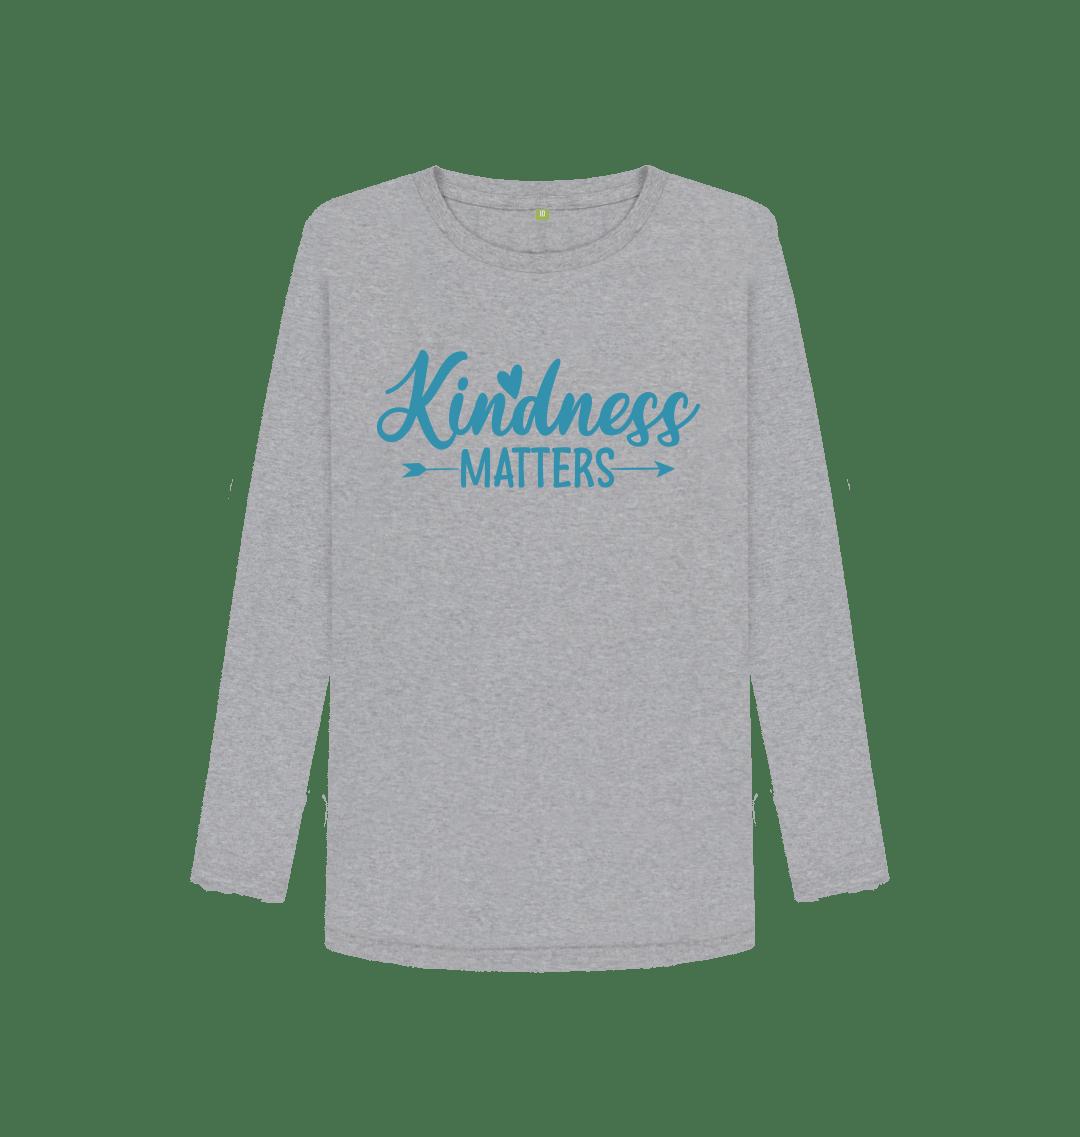 Kindness Matters Women's Long Sleeve Top in Grey